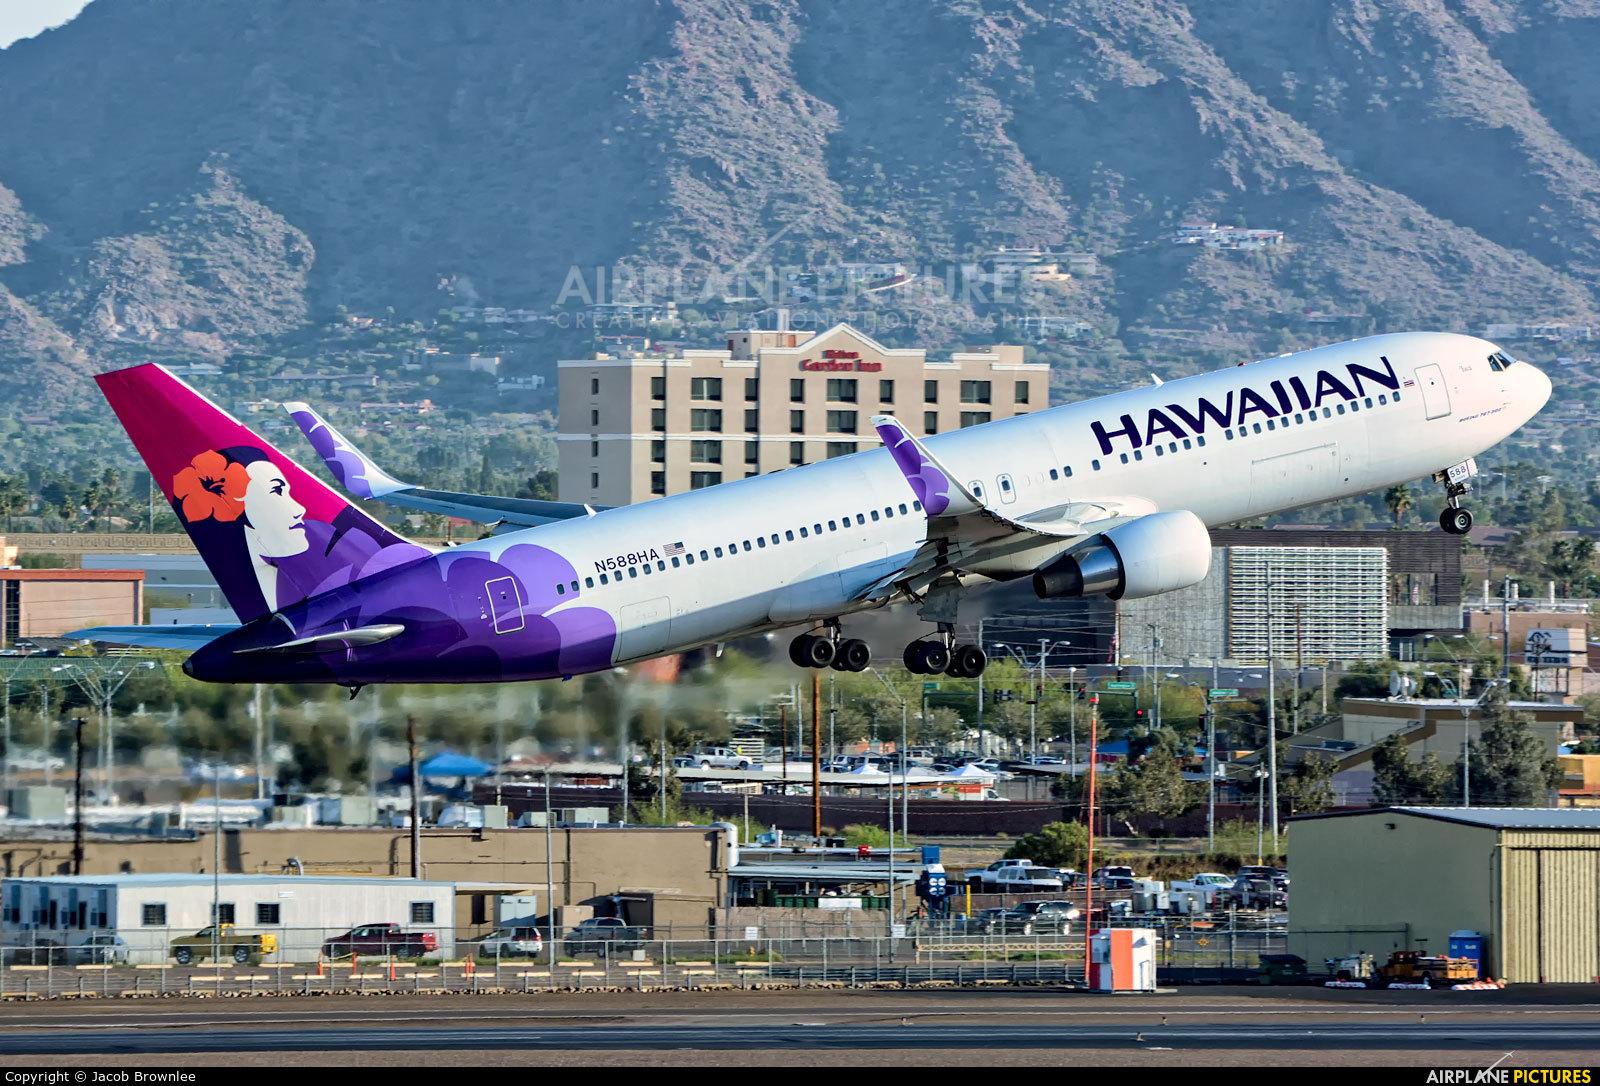 Hawaiian Airlines N588HA aircraft at Phoenix - Sky Harbor Intl